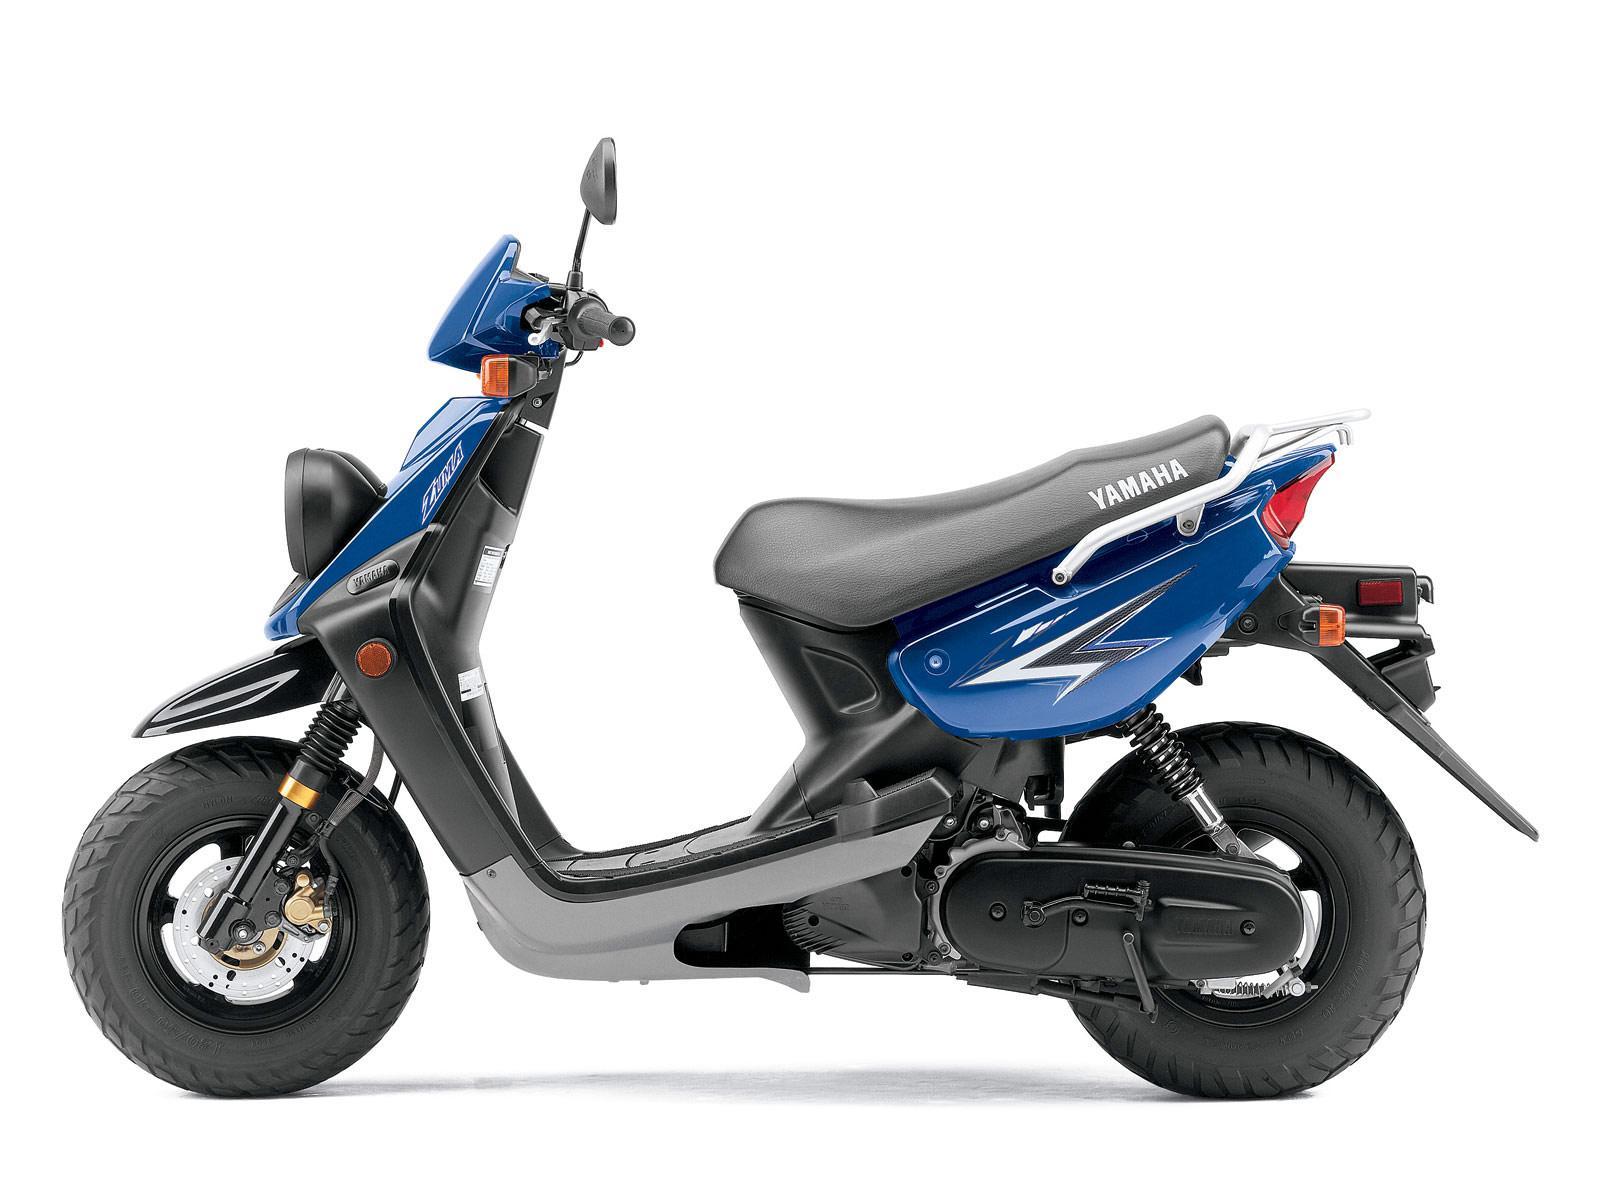 2011 YAMAHA Zuma 50 scooter wallpapers accident lawyers 1600x1200